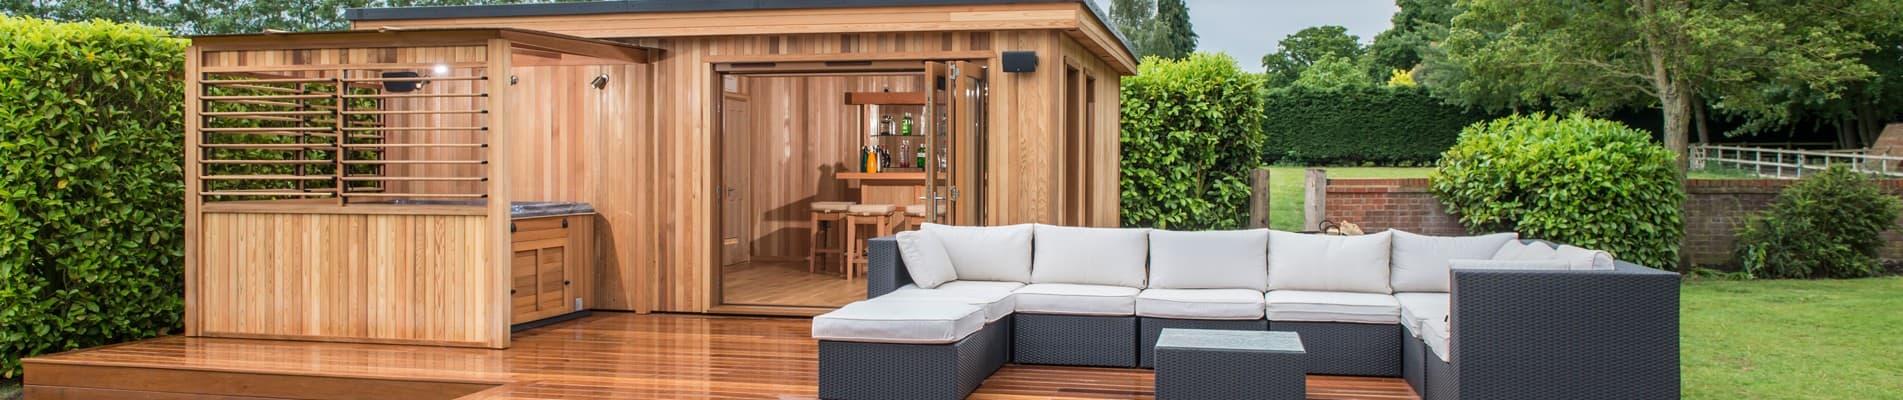 Luxury garden buildings pool houses in oxfordshire for Luxury garden office